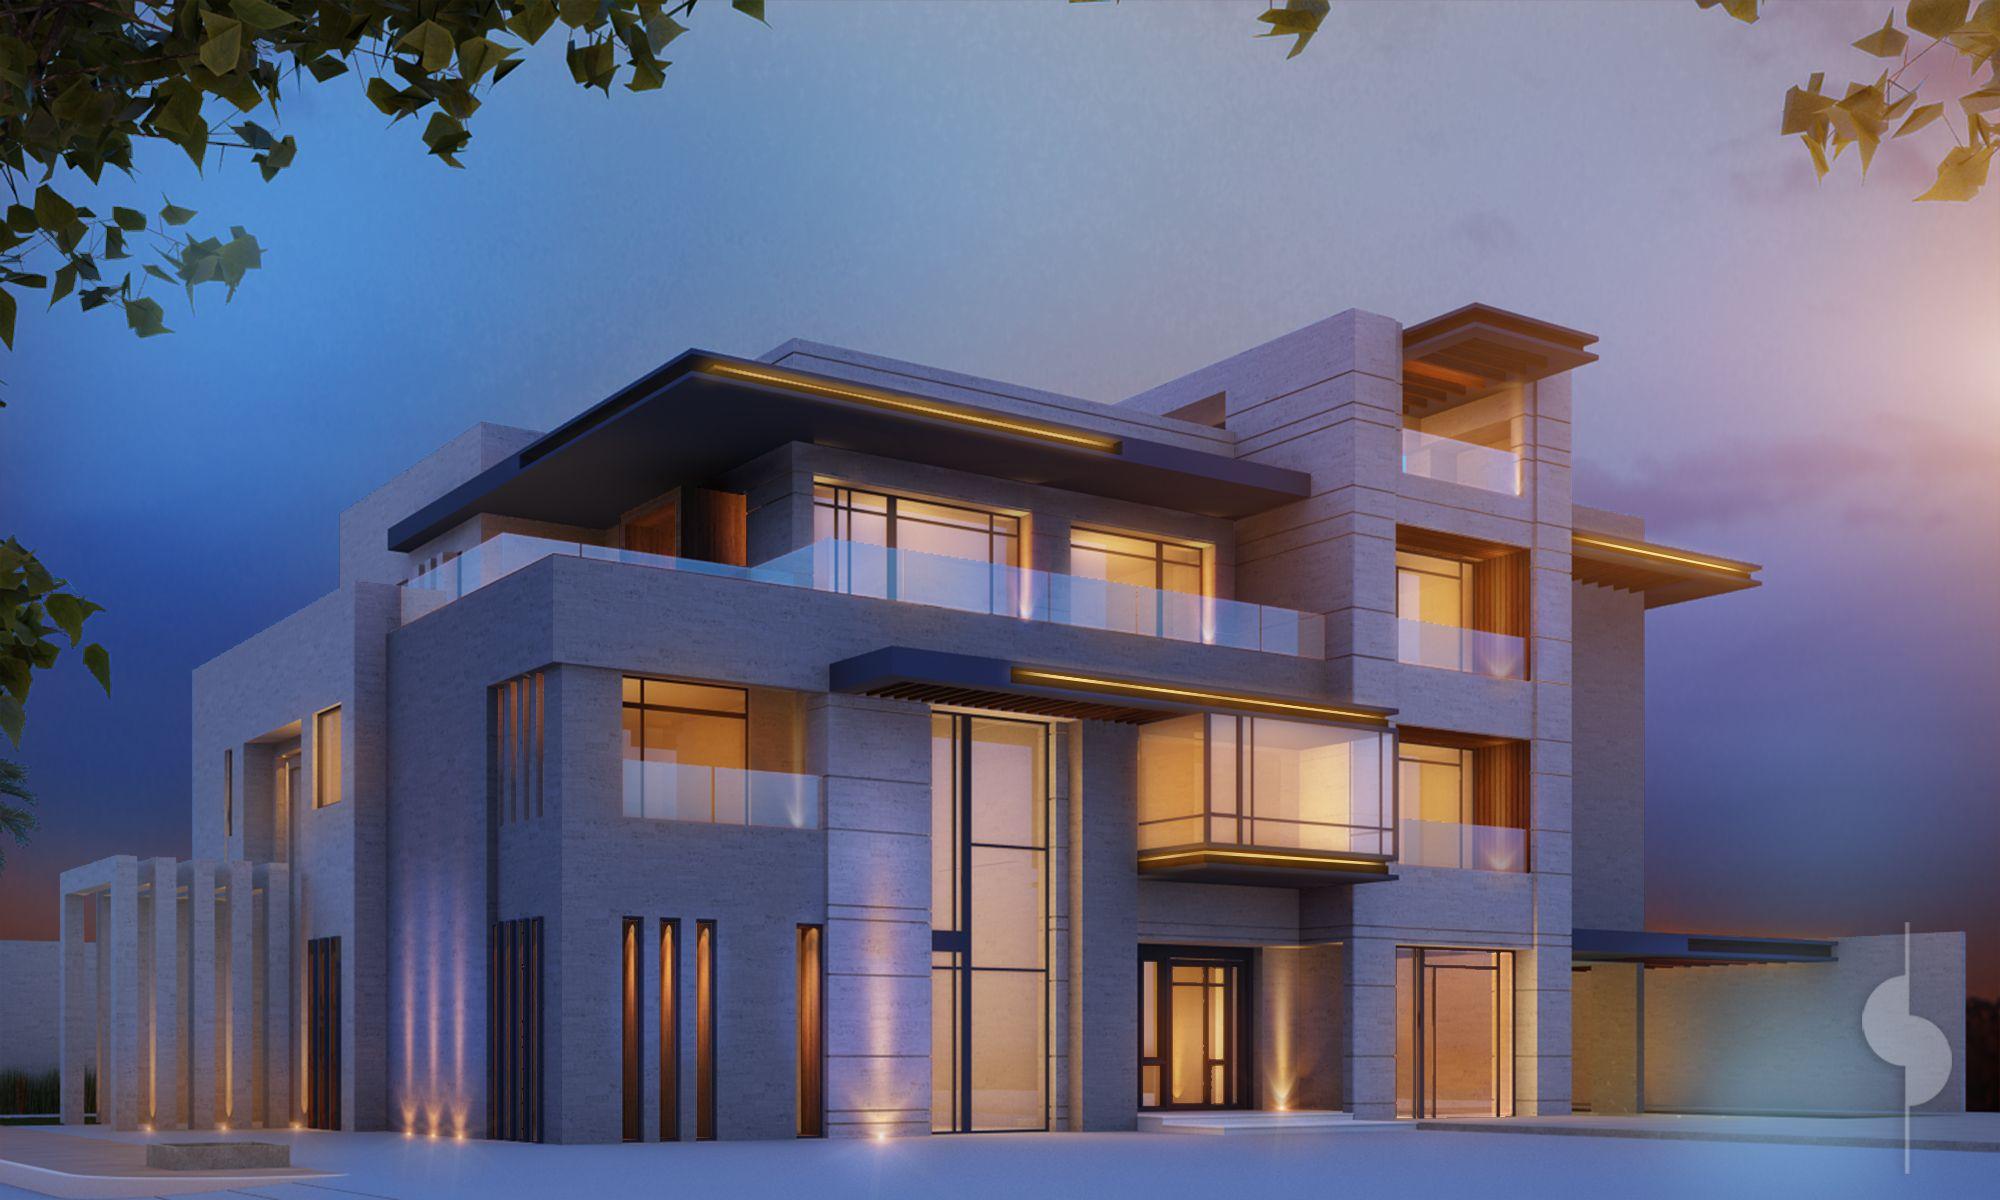 3800 m plot private villa sea side sarah sadeq architects sarah sadeq architectes pinterest. Black Bedroom Furniture Sets. Home Design Ideas